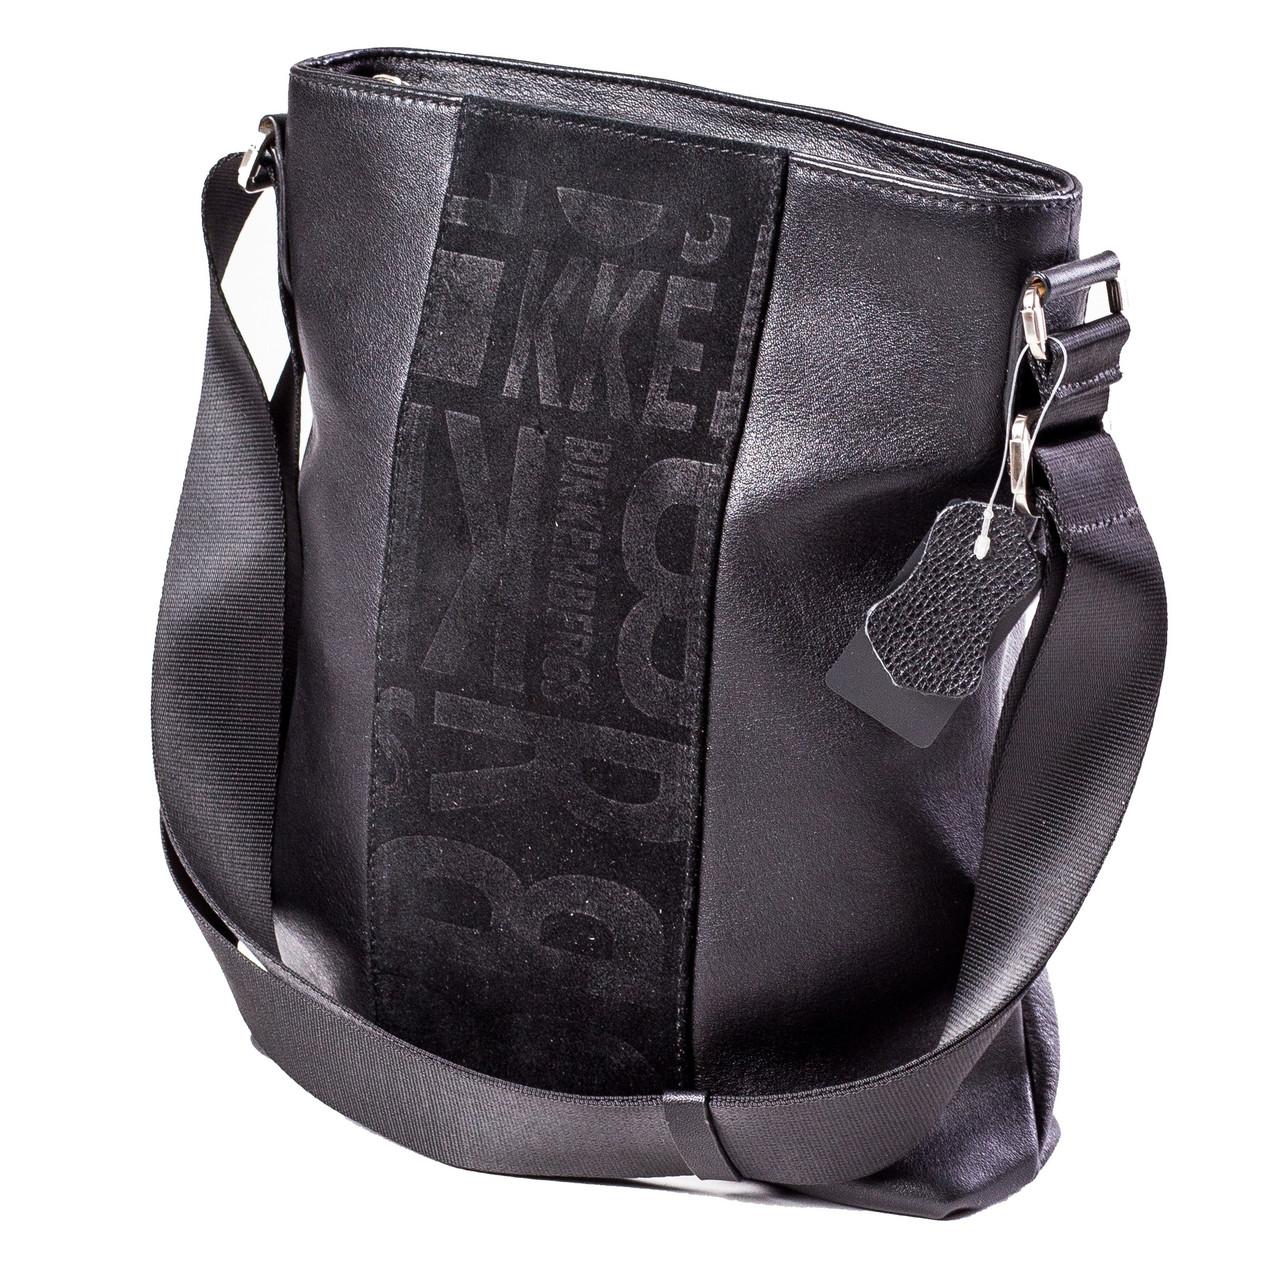 Мужская сумка кожаная черная Eminsa 6112-12-1